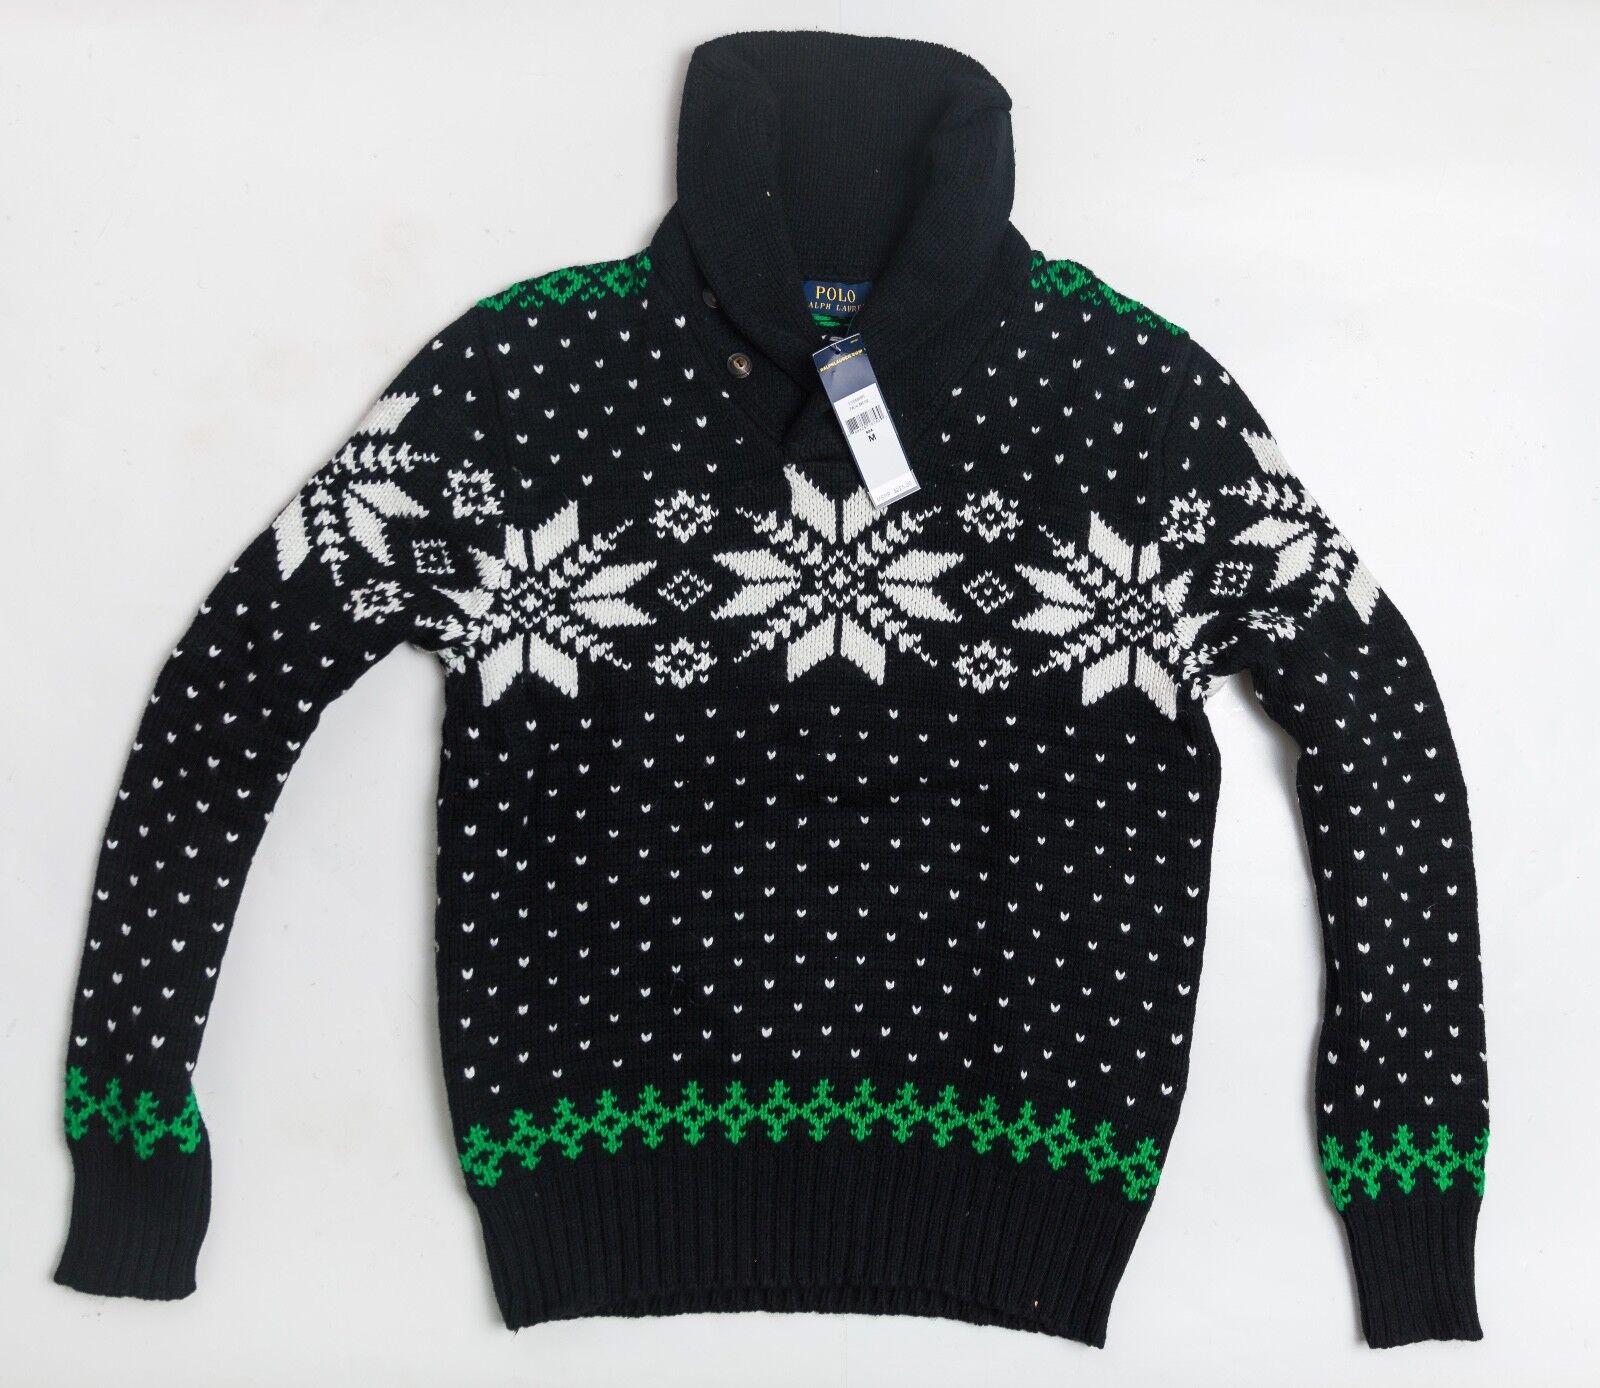 NWT Ralph Lauren Polo Snowflake  Herren Sweater M MEDIUM 225 Wool Blend Pullover